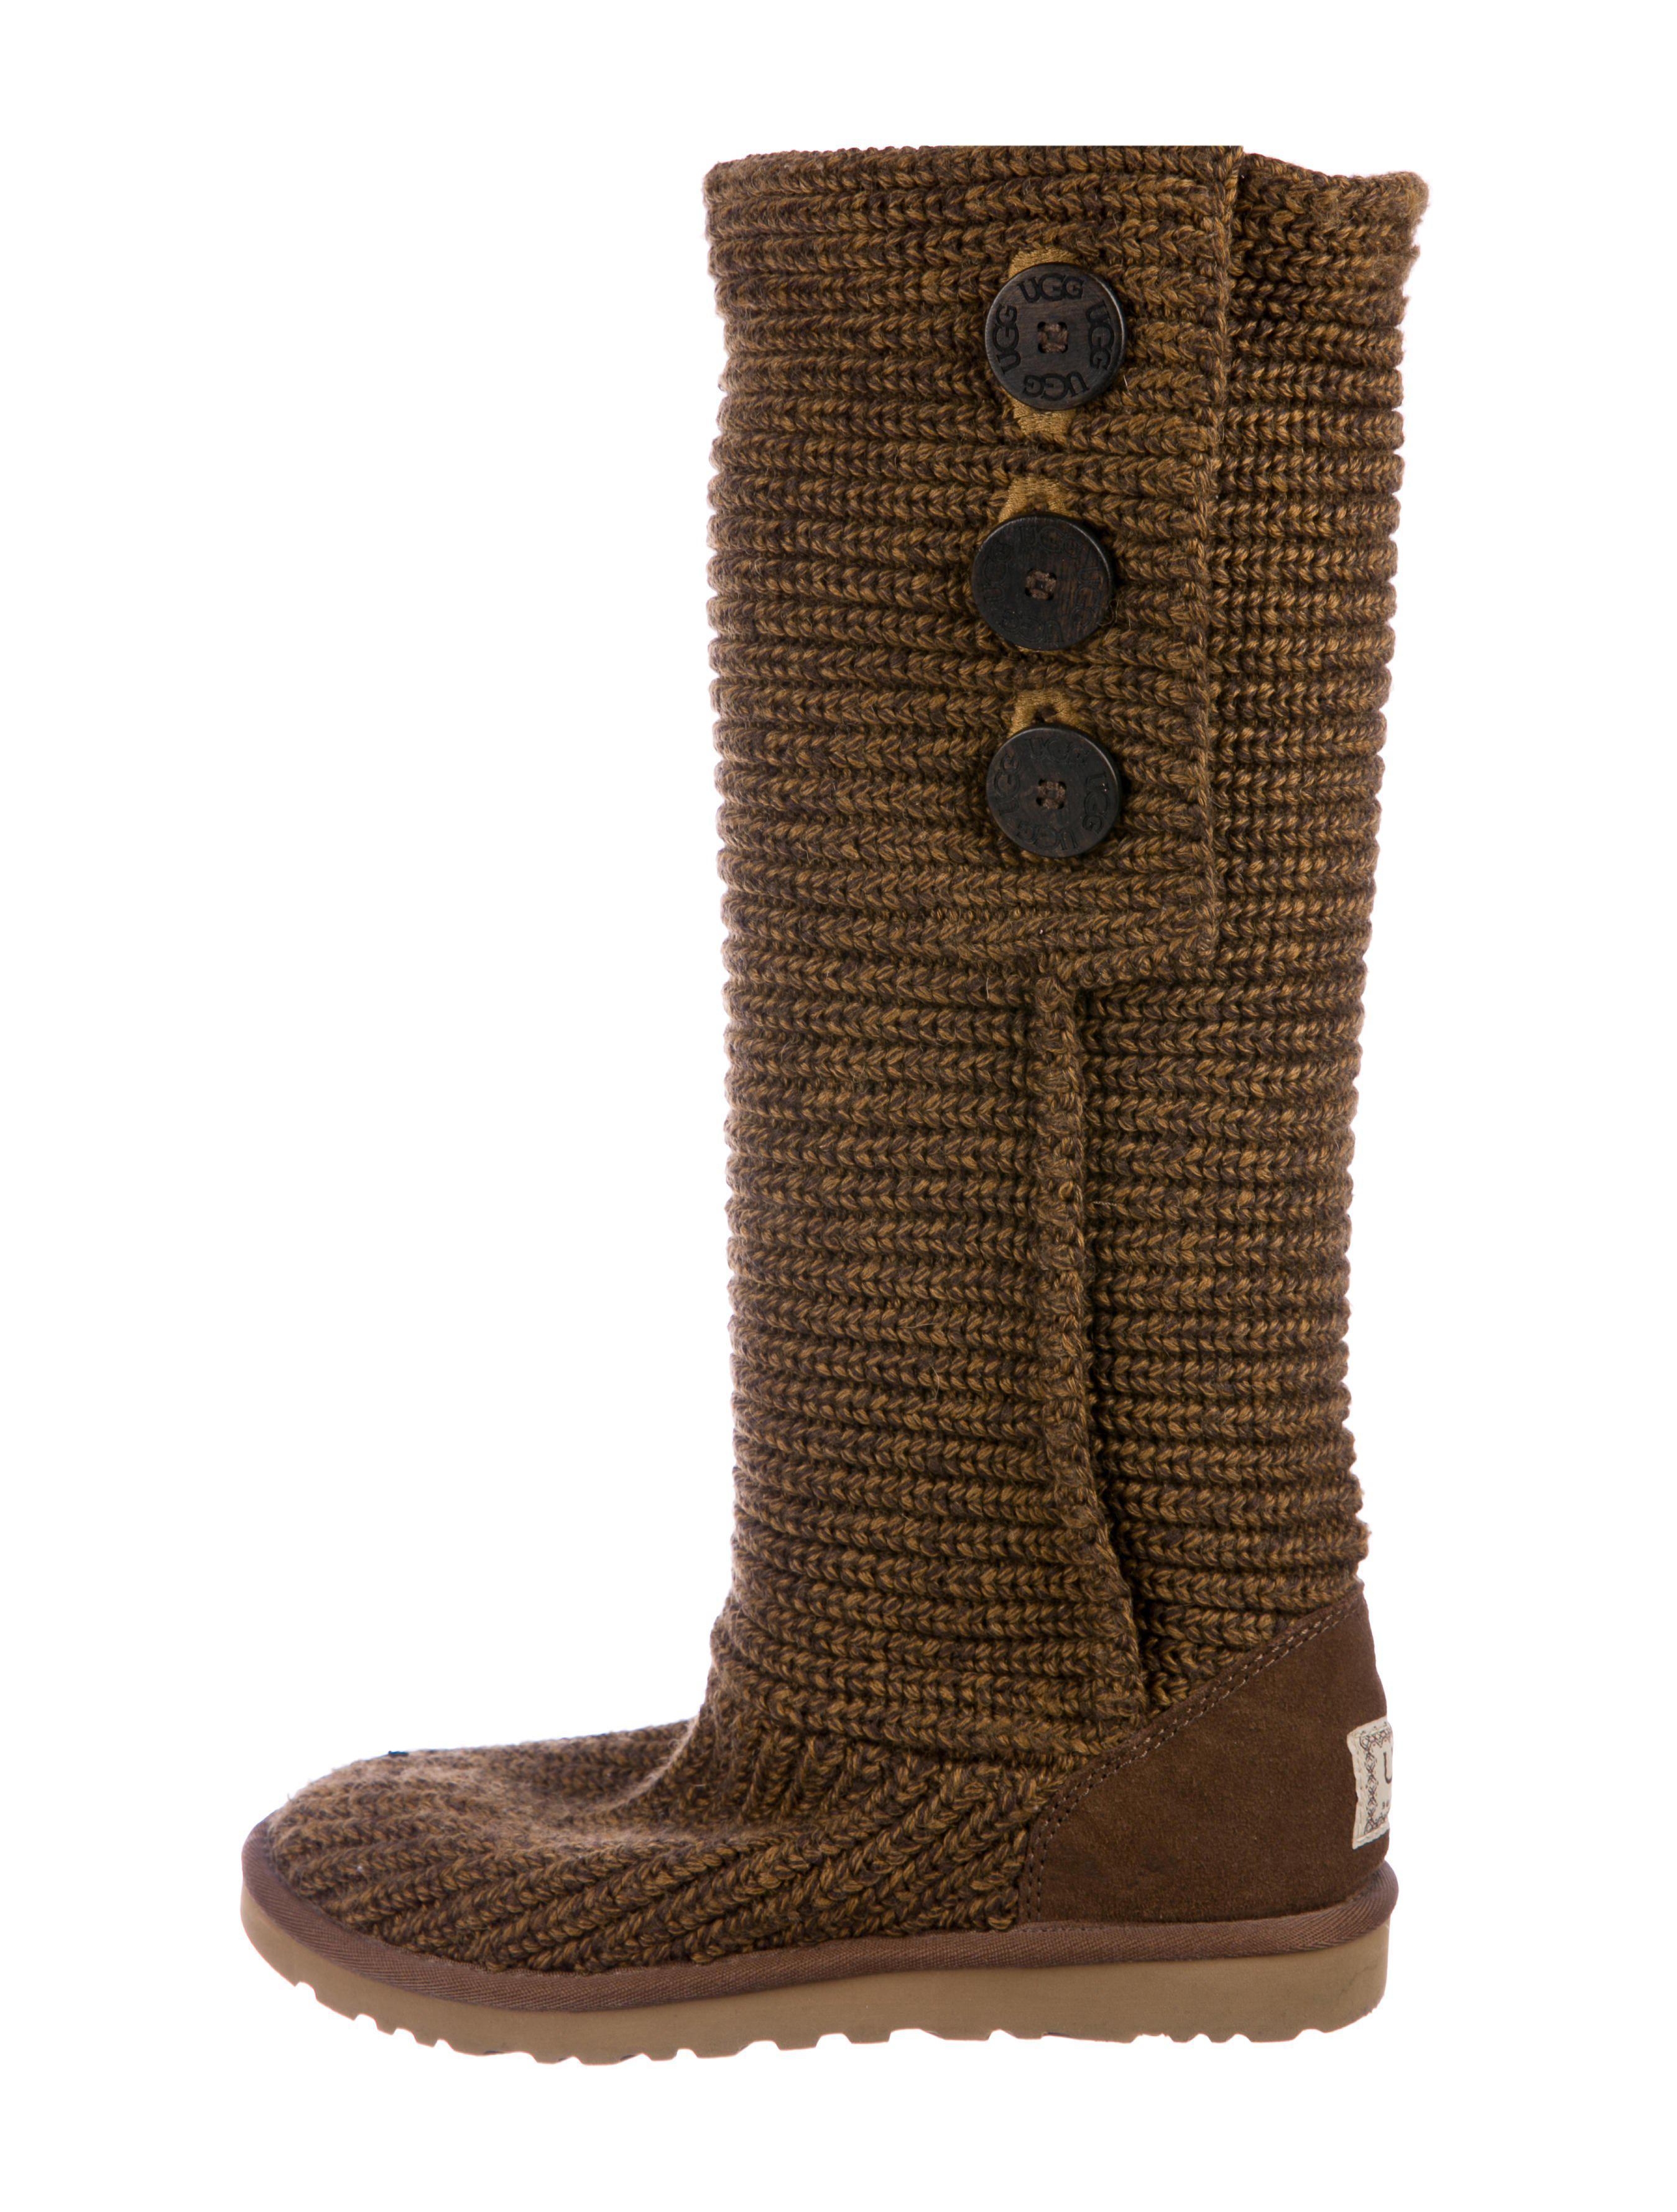 UGG. Women's Brown Knit Knee-high Boots